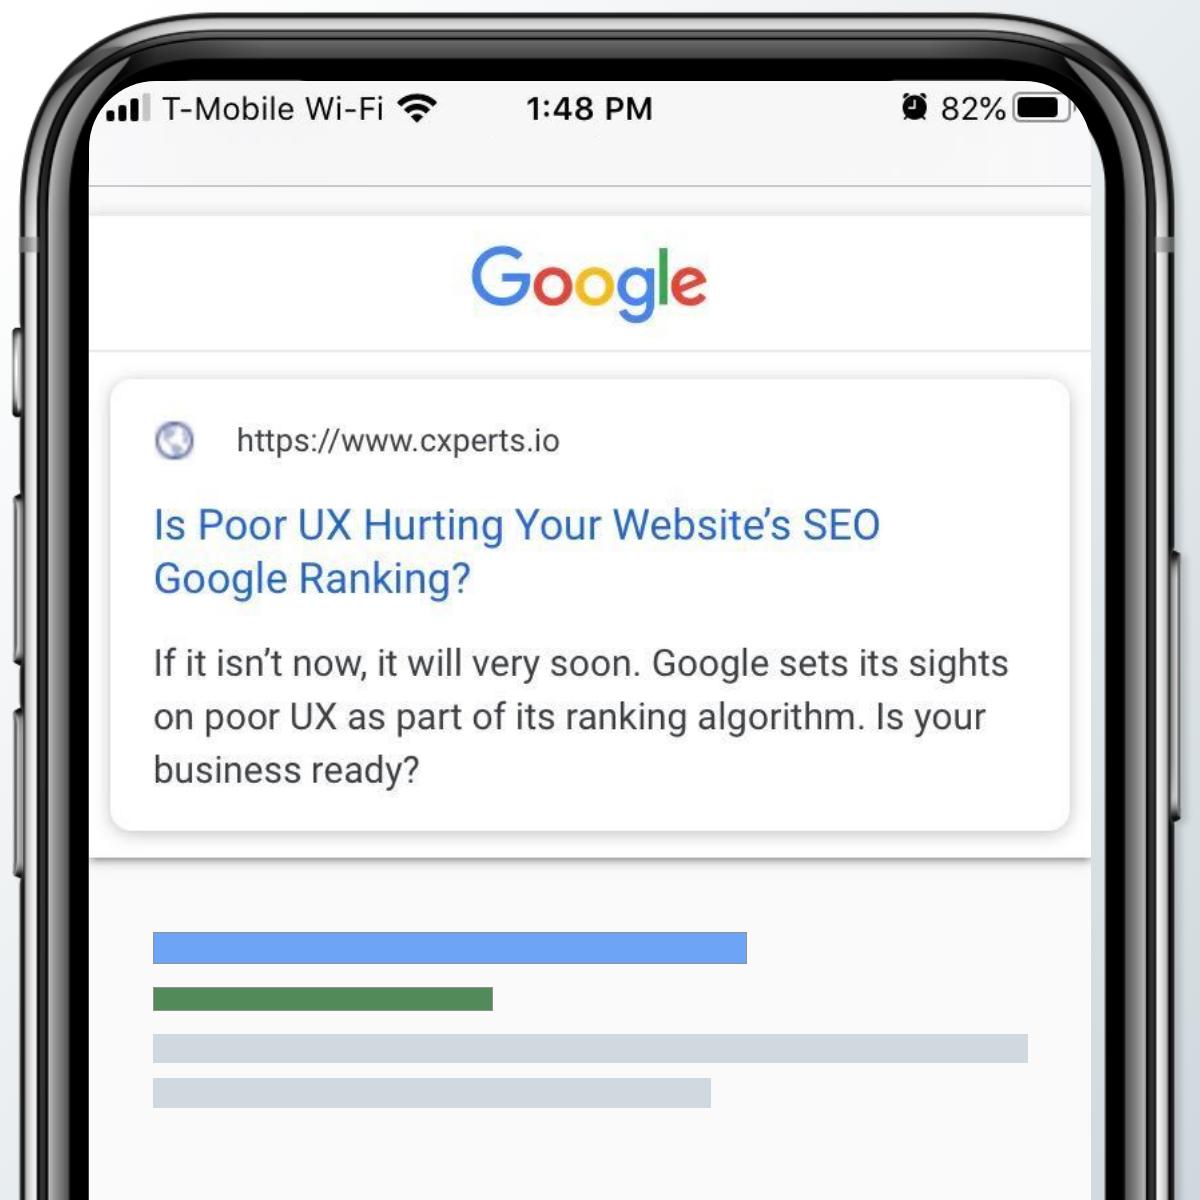 Is Poor UX Hurting Your Website's SEO Google Ranking?